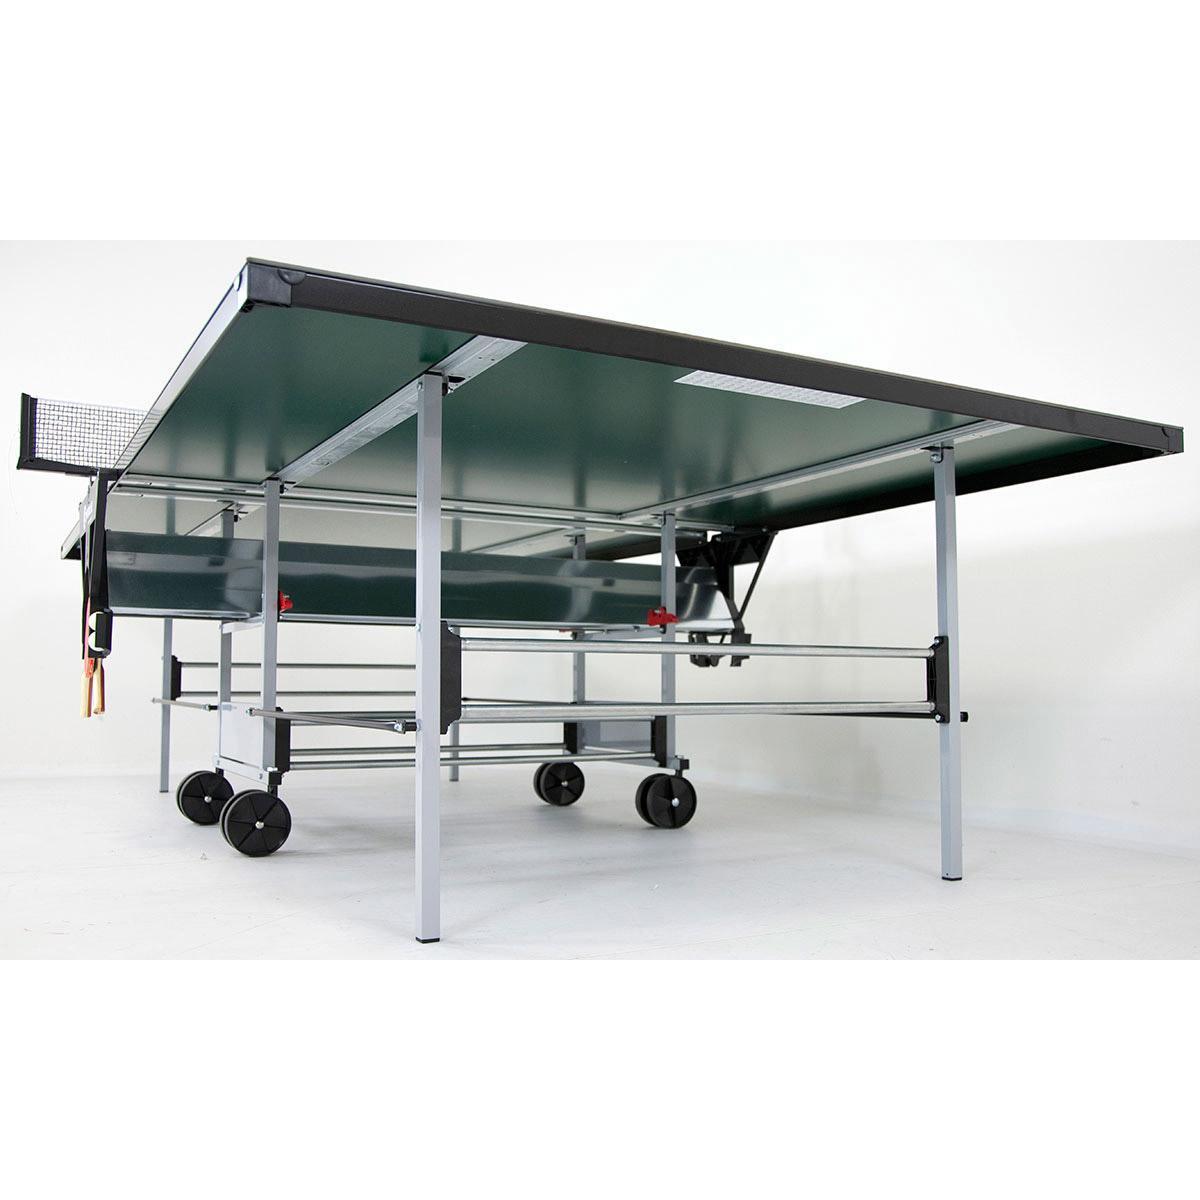 Sponeta sportline playback 5mm outdoor table tennis table green - Sponeta table tennis table ...